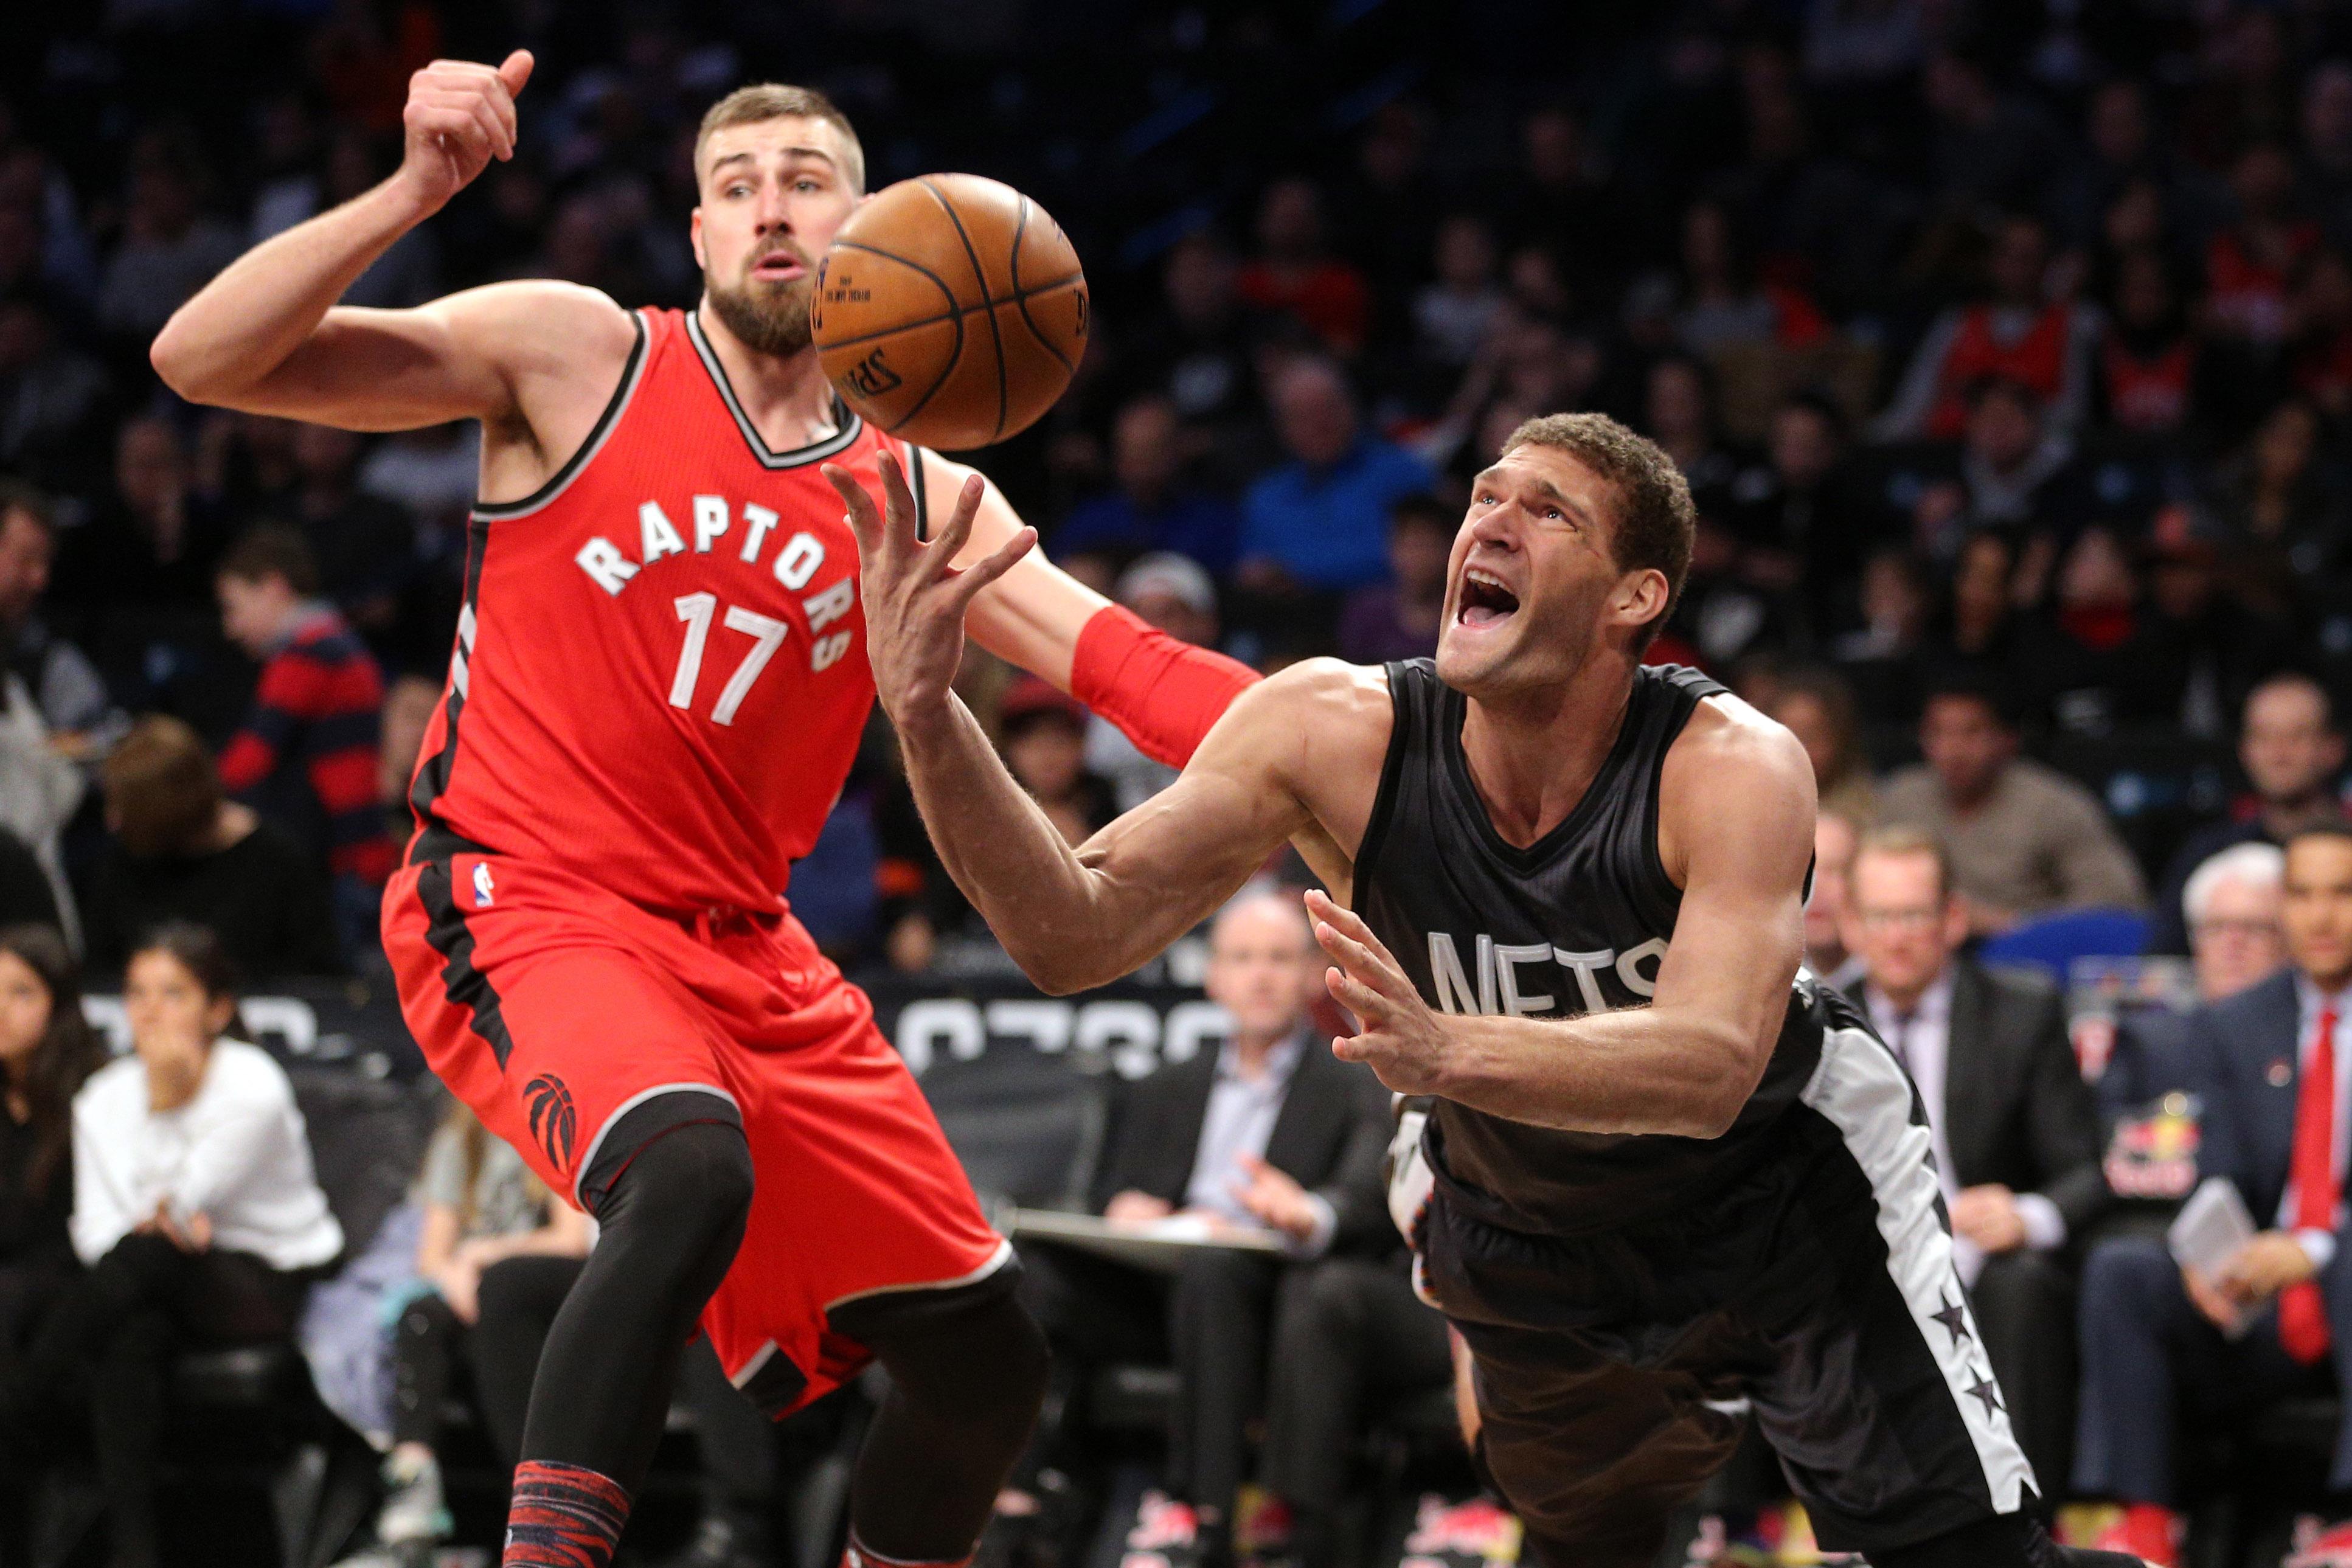 Raptors: Brooklyn Nets Week 16 Outlook: The Slide Can't Stop